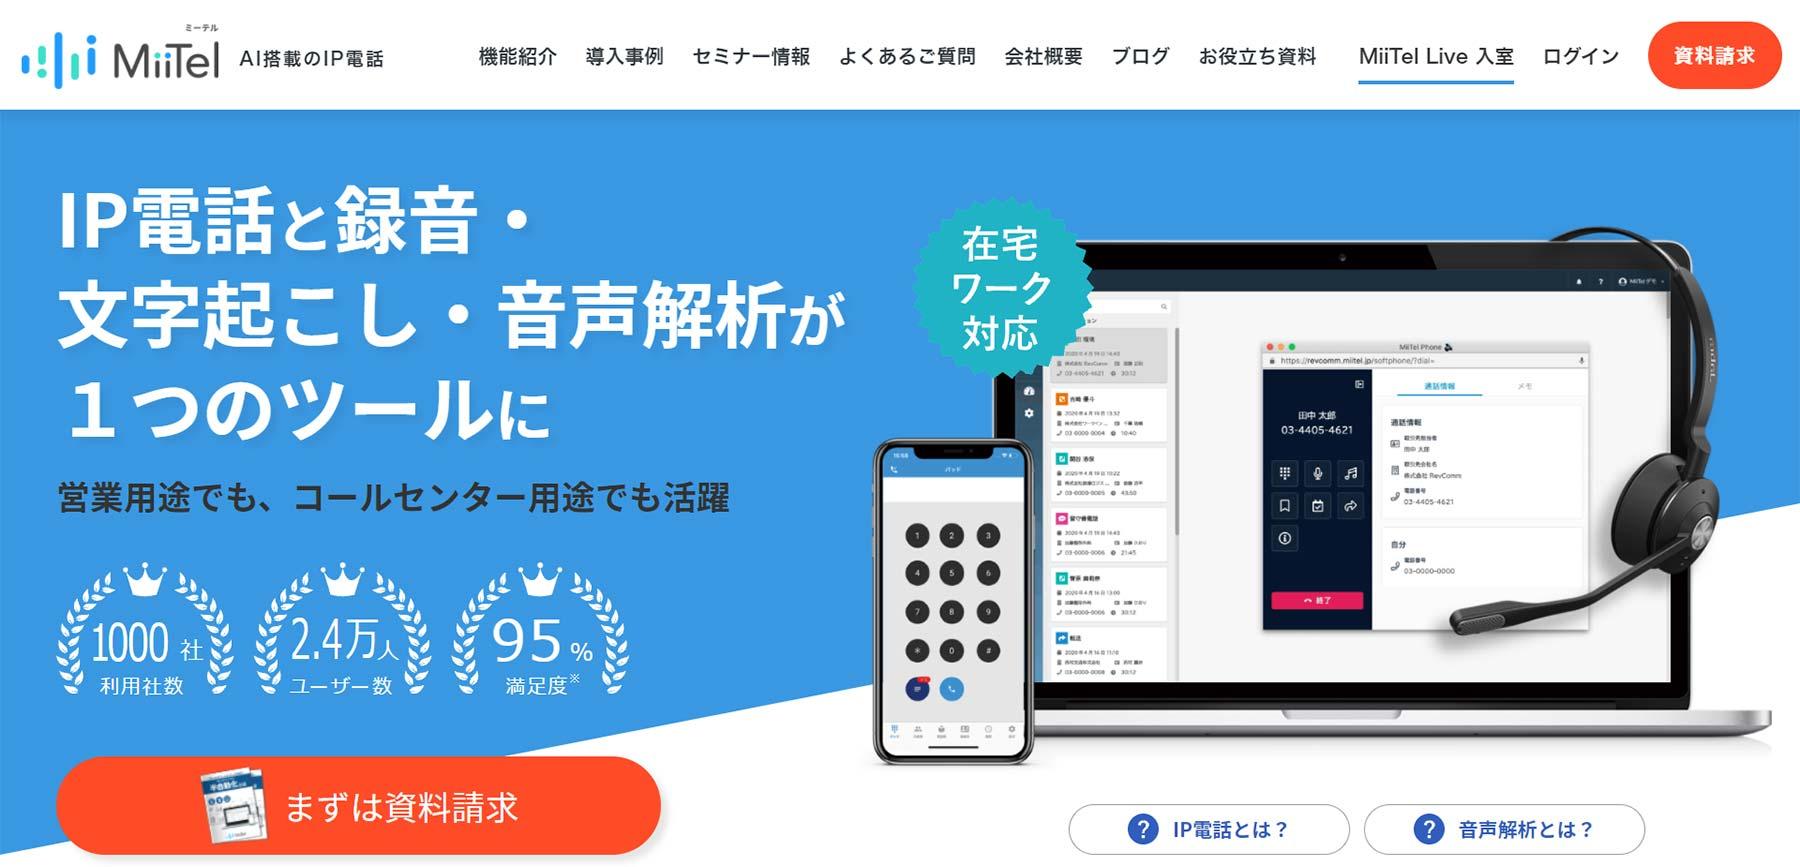 MiiTel公式Webサイト